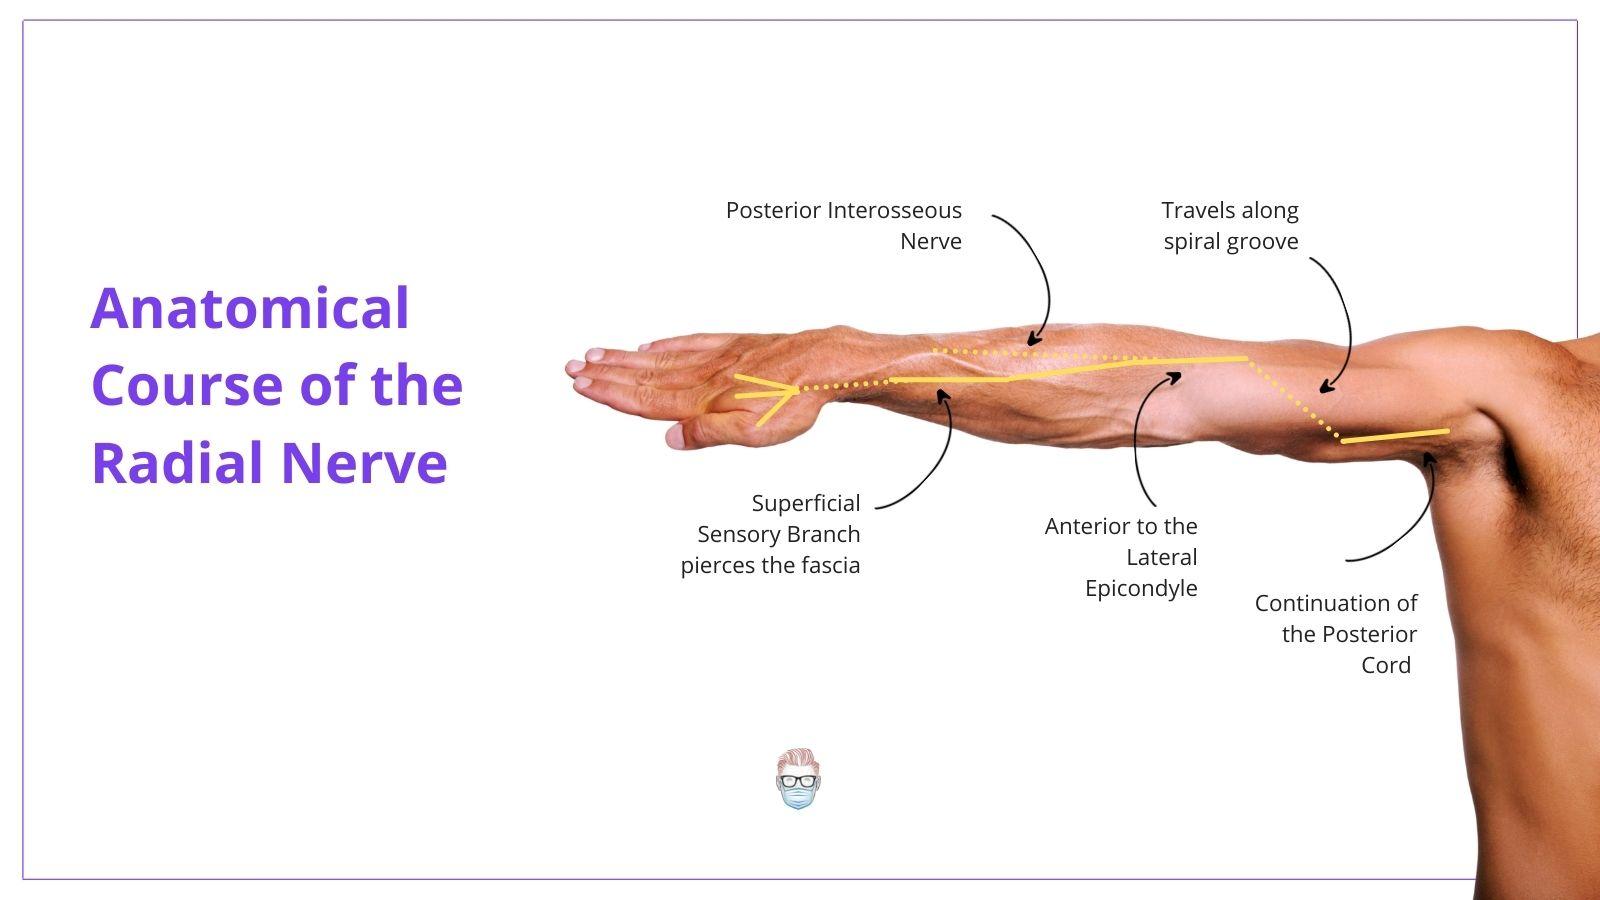 Radial Nerve, Radial Nerve Palsy, Radial Nerve Anatomy, Radial Nerve Course, Radial Never Pathway, Radial Nerve Branches, Radial Never Innervation, Radial Nerve Sensation